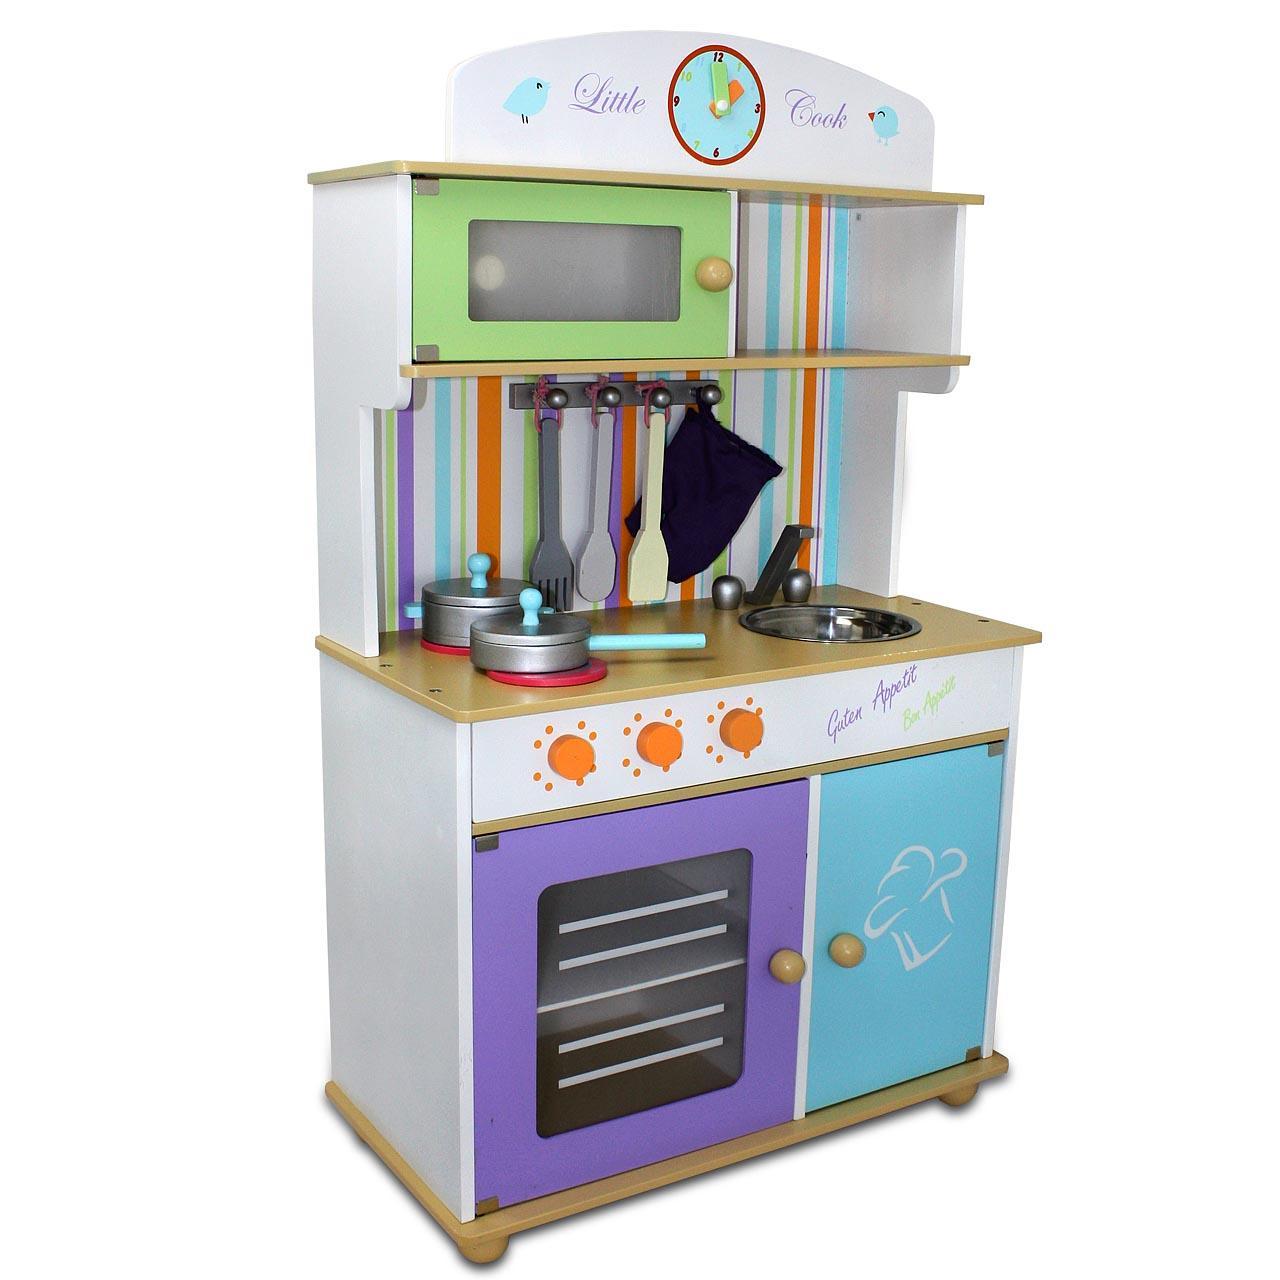 Wooden Kitchen Kids Fun Children Cooking Role Play Toy Playset Creative Game